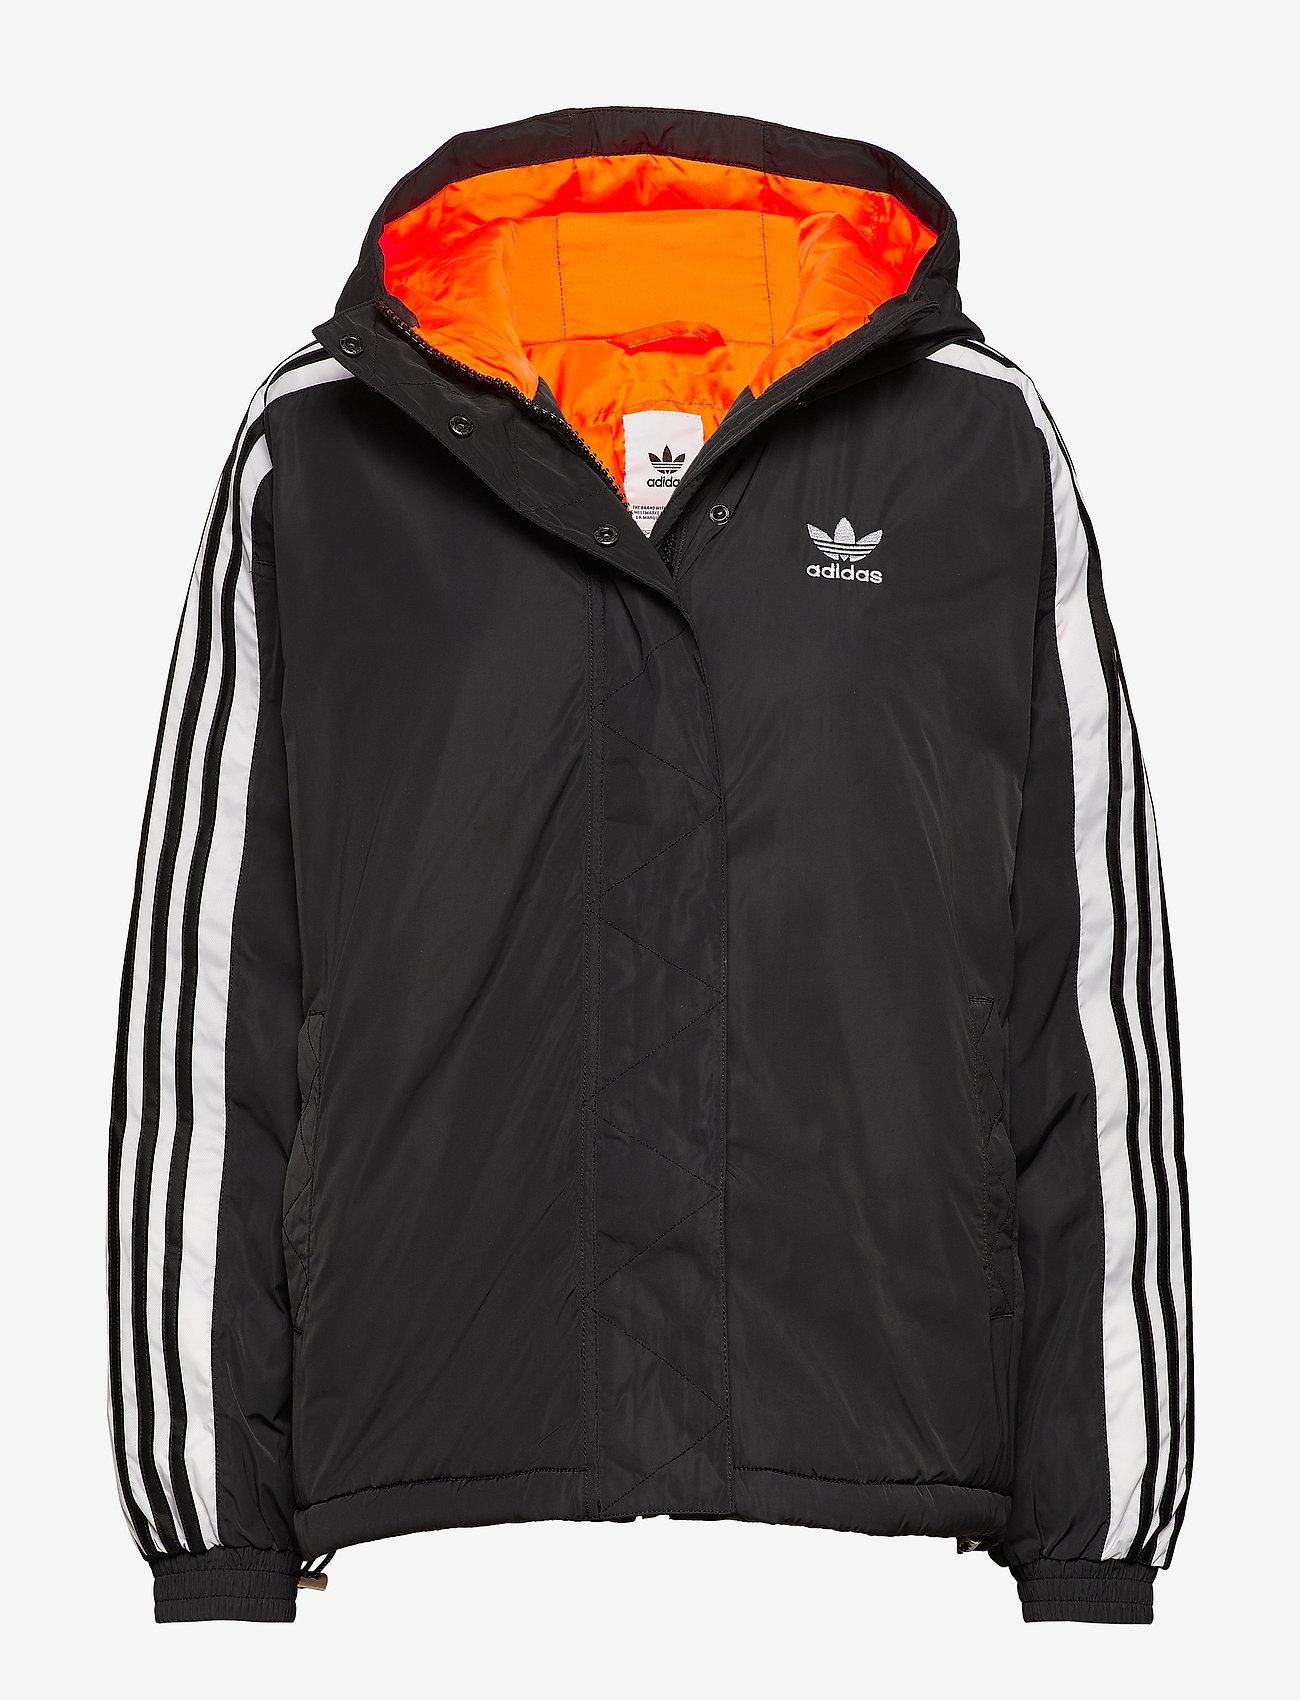 adidas Originals - SHORT SYN DOWN - kurtki sportowe - black - 0